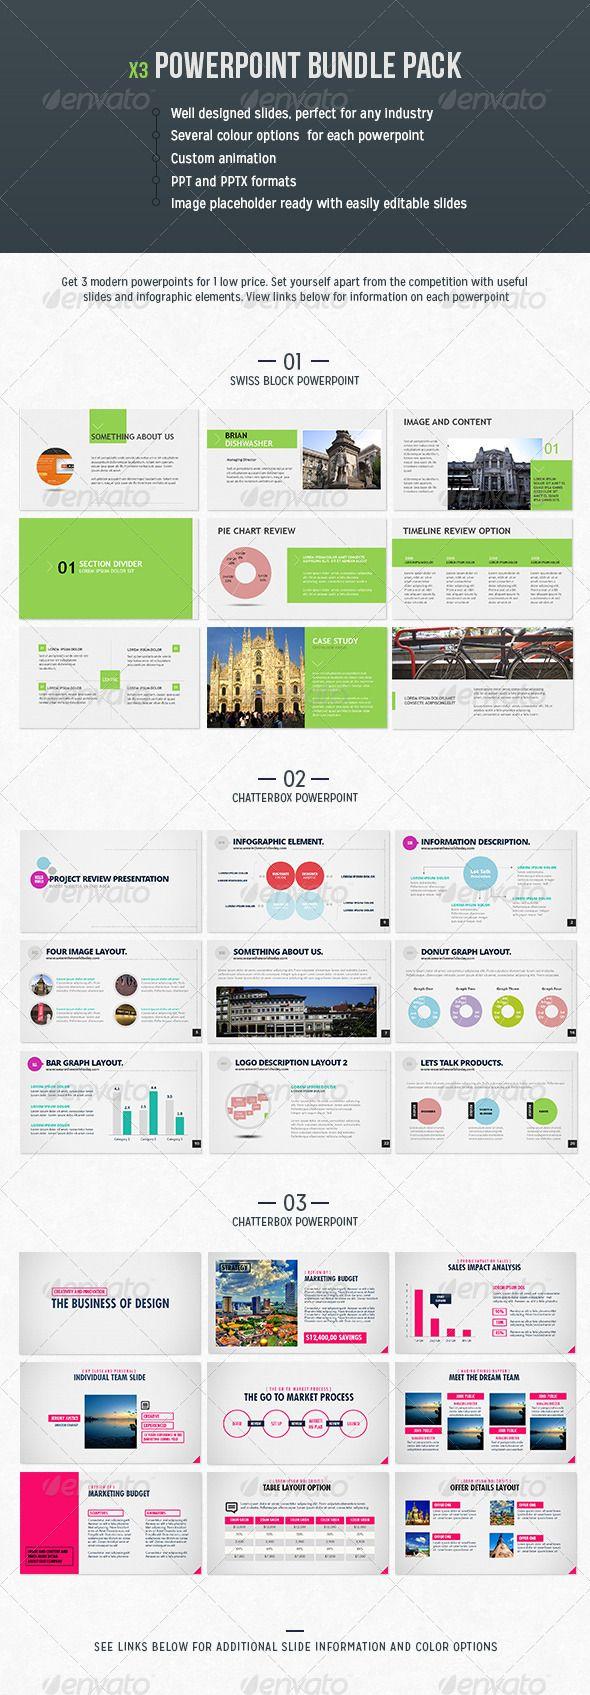 Powerpoint Bundle Cool powerpoint templates, Creative